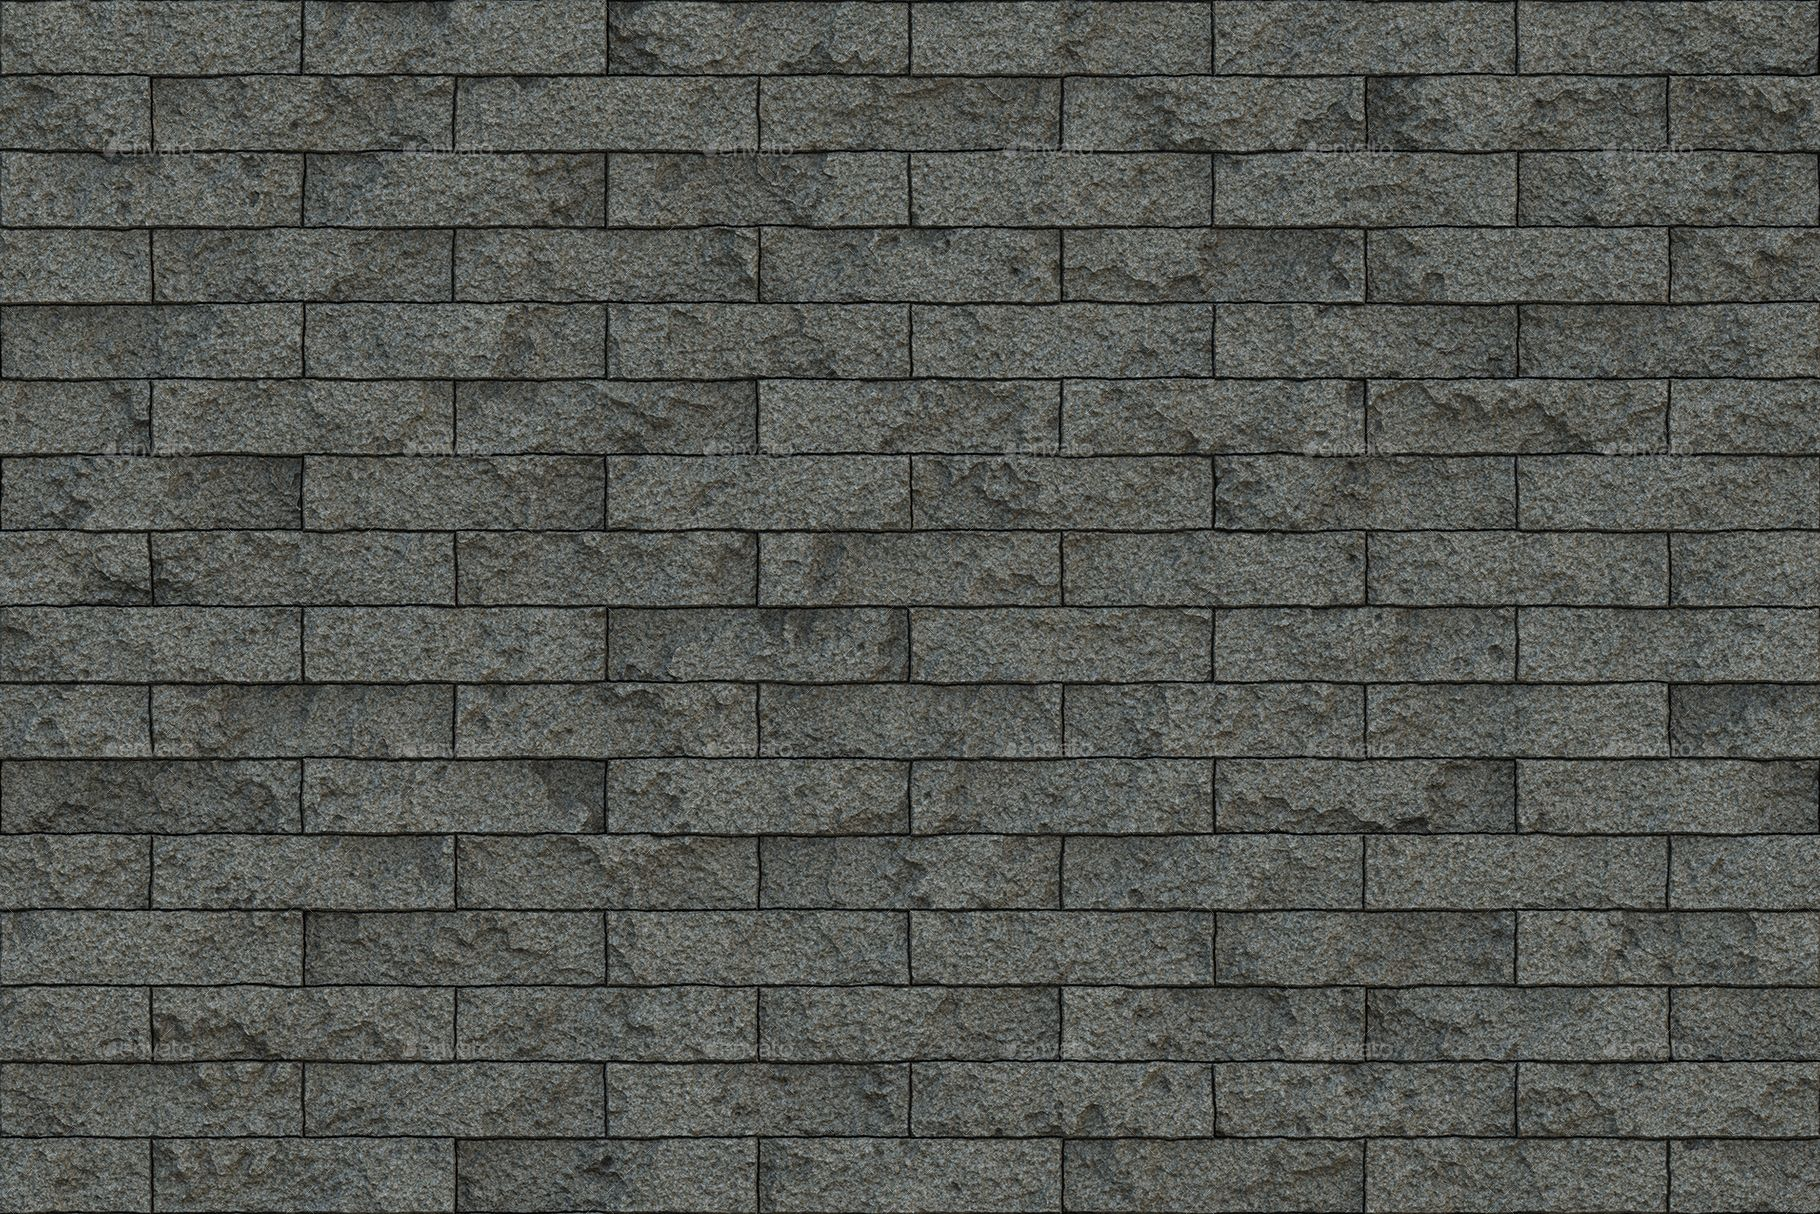 10 Stone Block Wall Textures Stone Blocks Textured Walls Block Wall